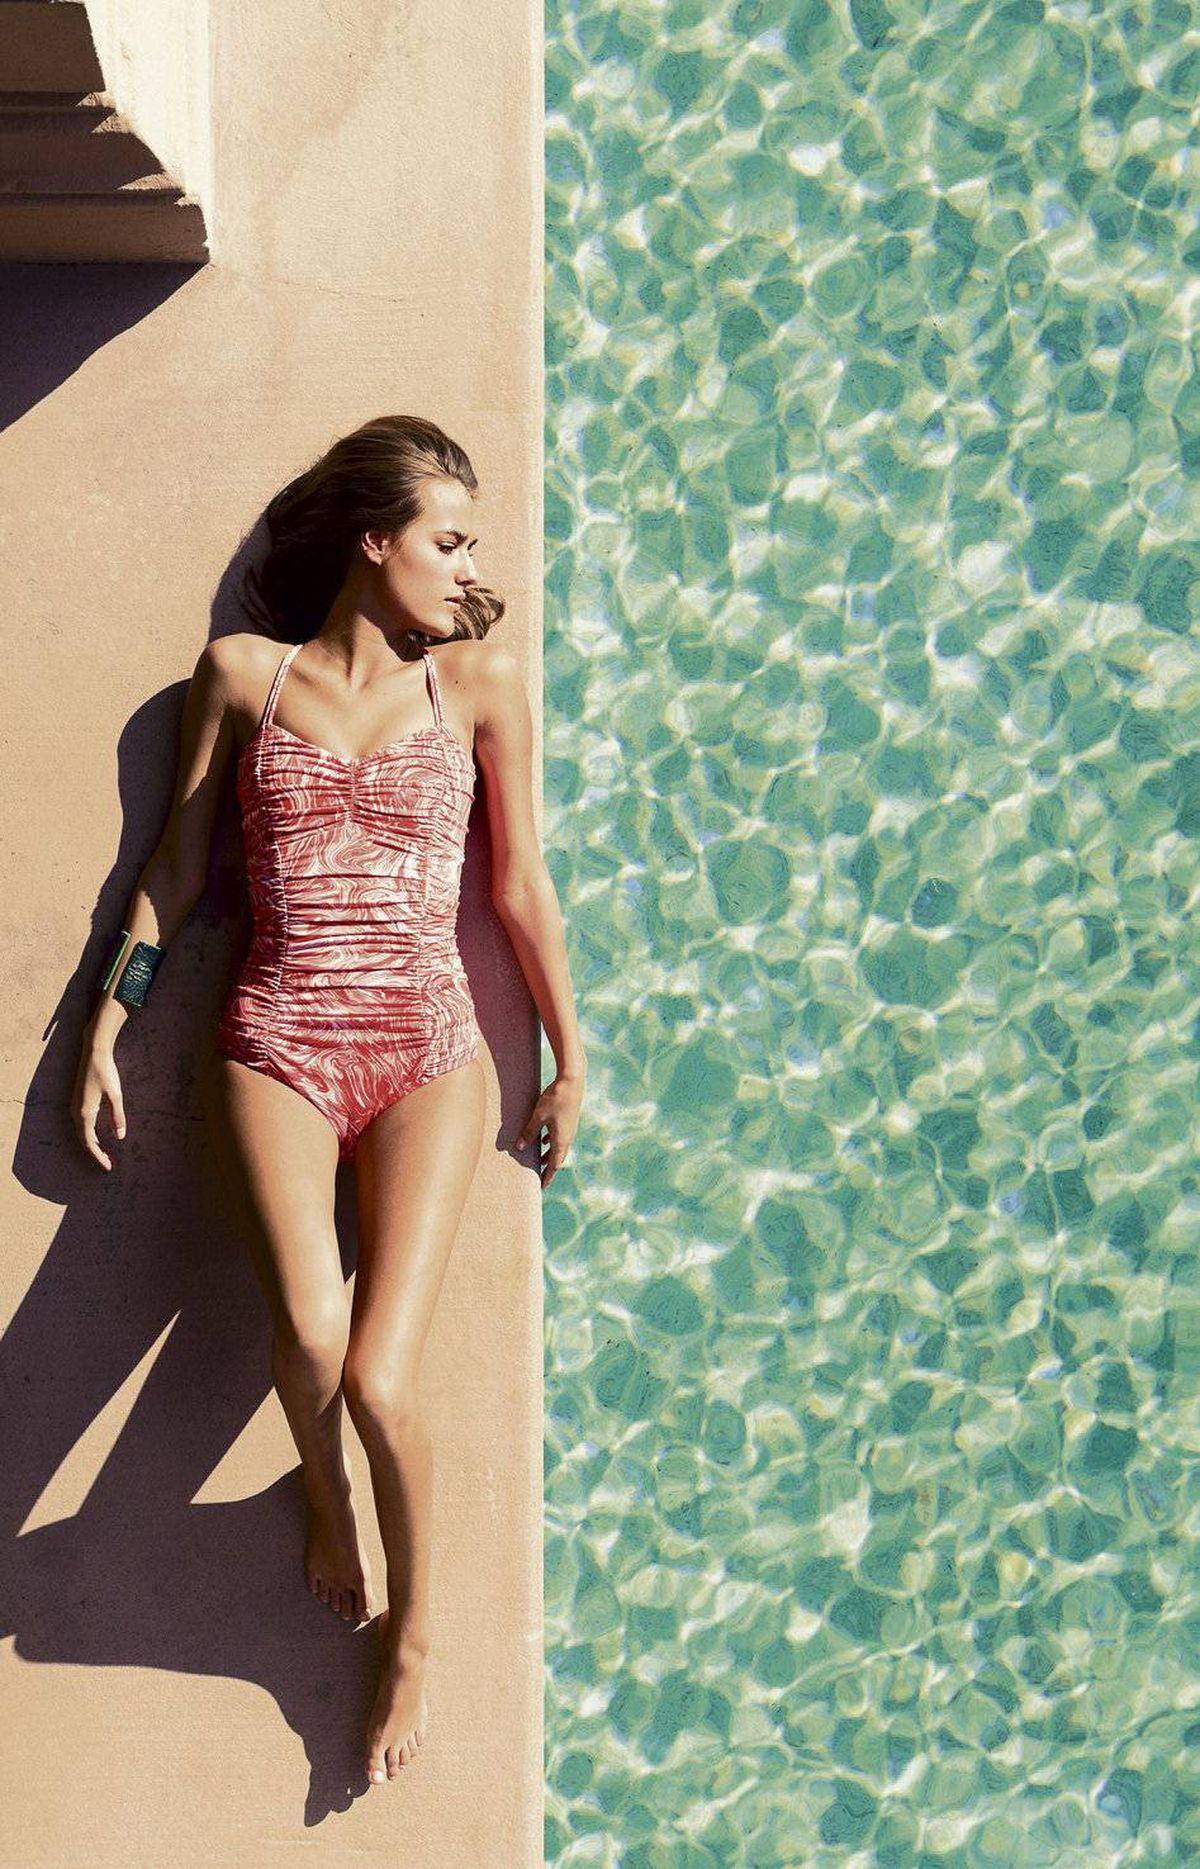 Michael Kors swimsuit, $309 at Holt Renfrew. Dandi Maestre cuff, $350.